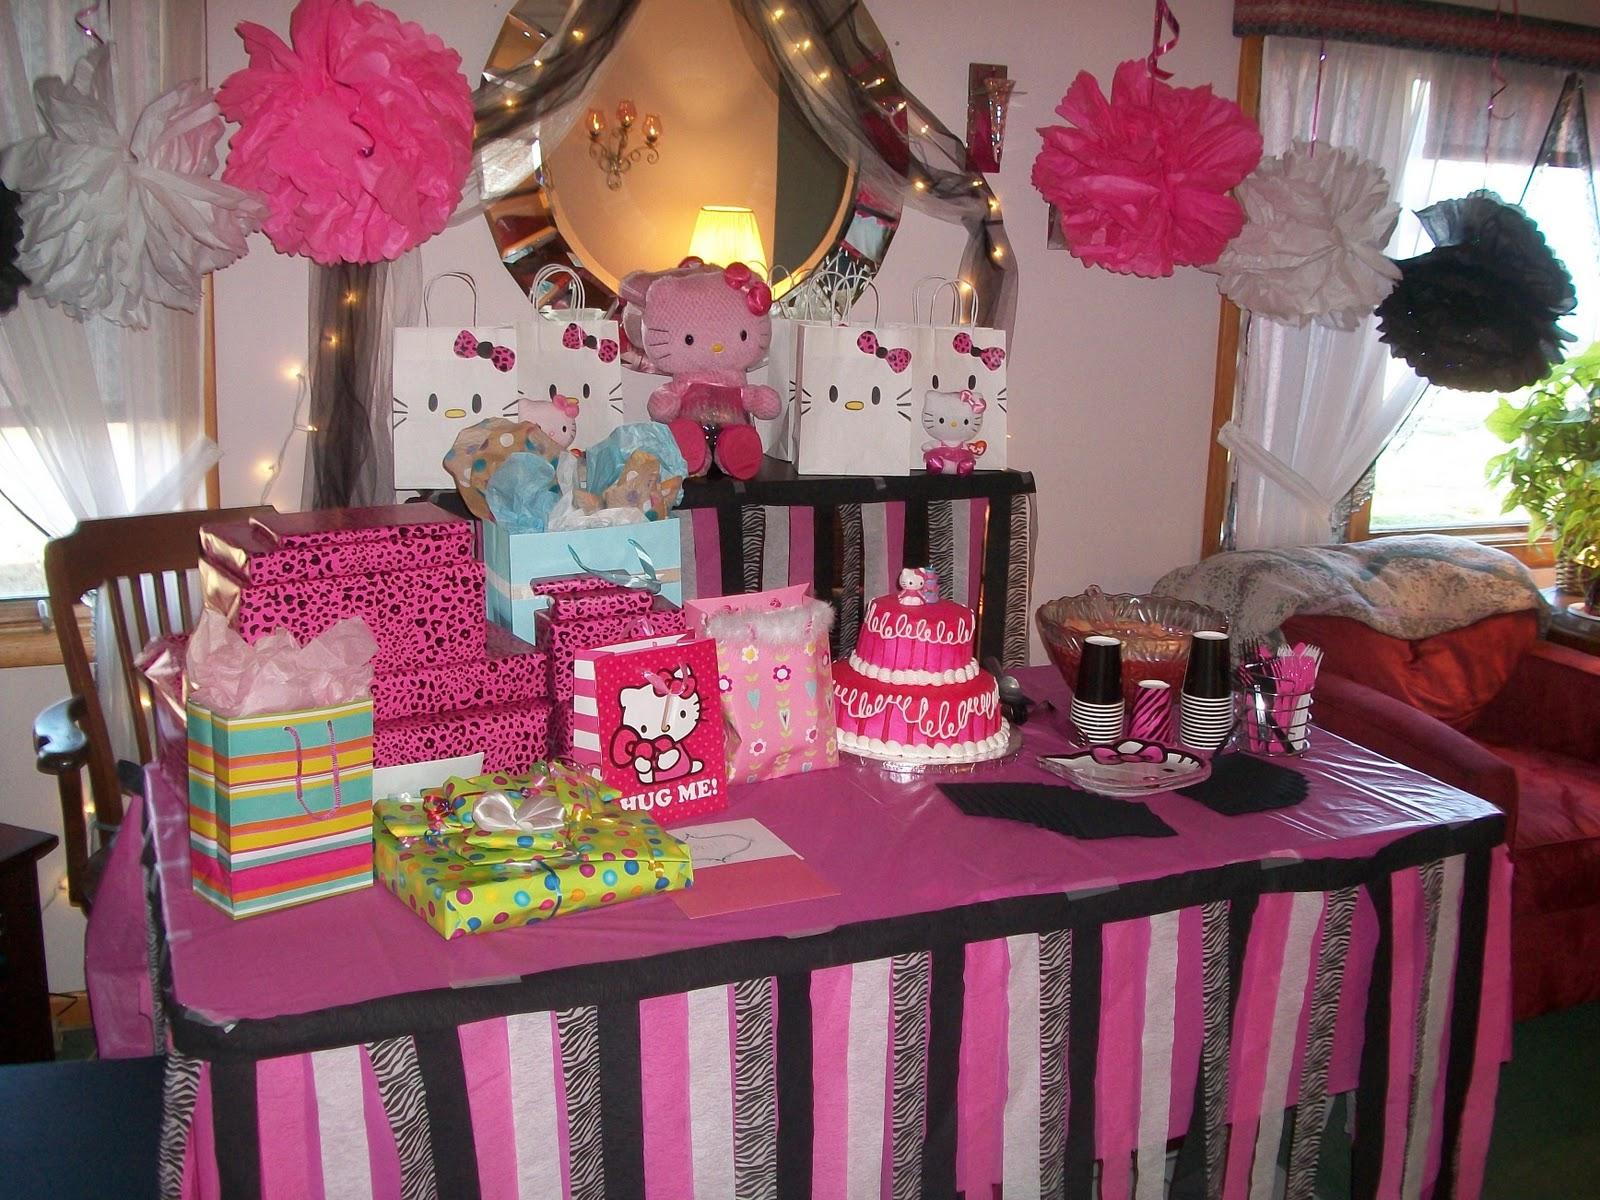 diy hello kitty birthday party ideas Colesthecolossusco